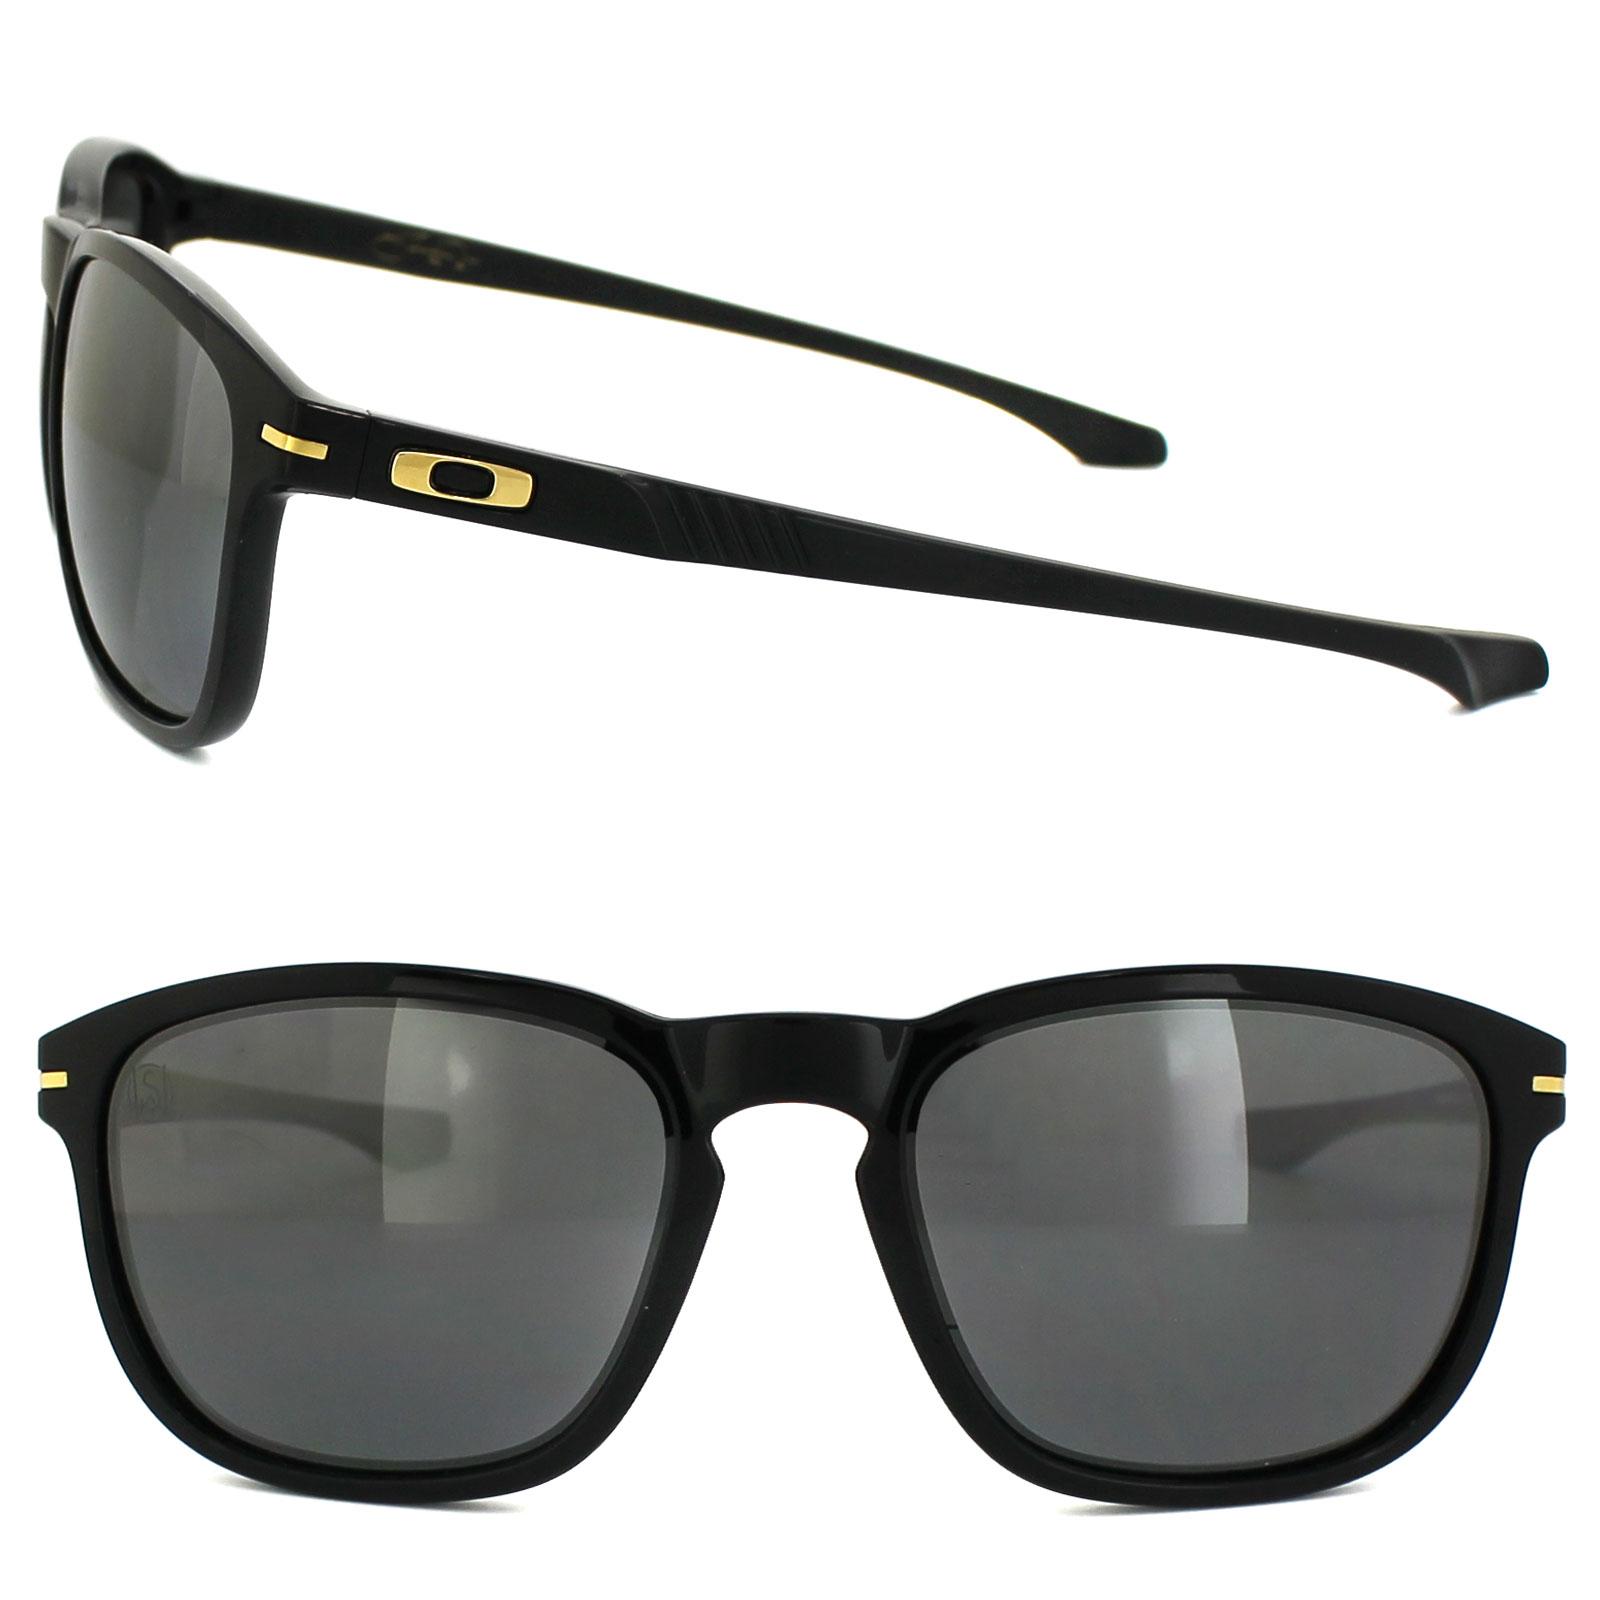 ae38d444b4 Shaun White Oakley Sunglasses Ebay « Heritage Malta